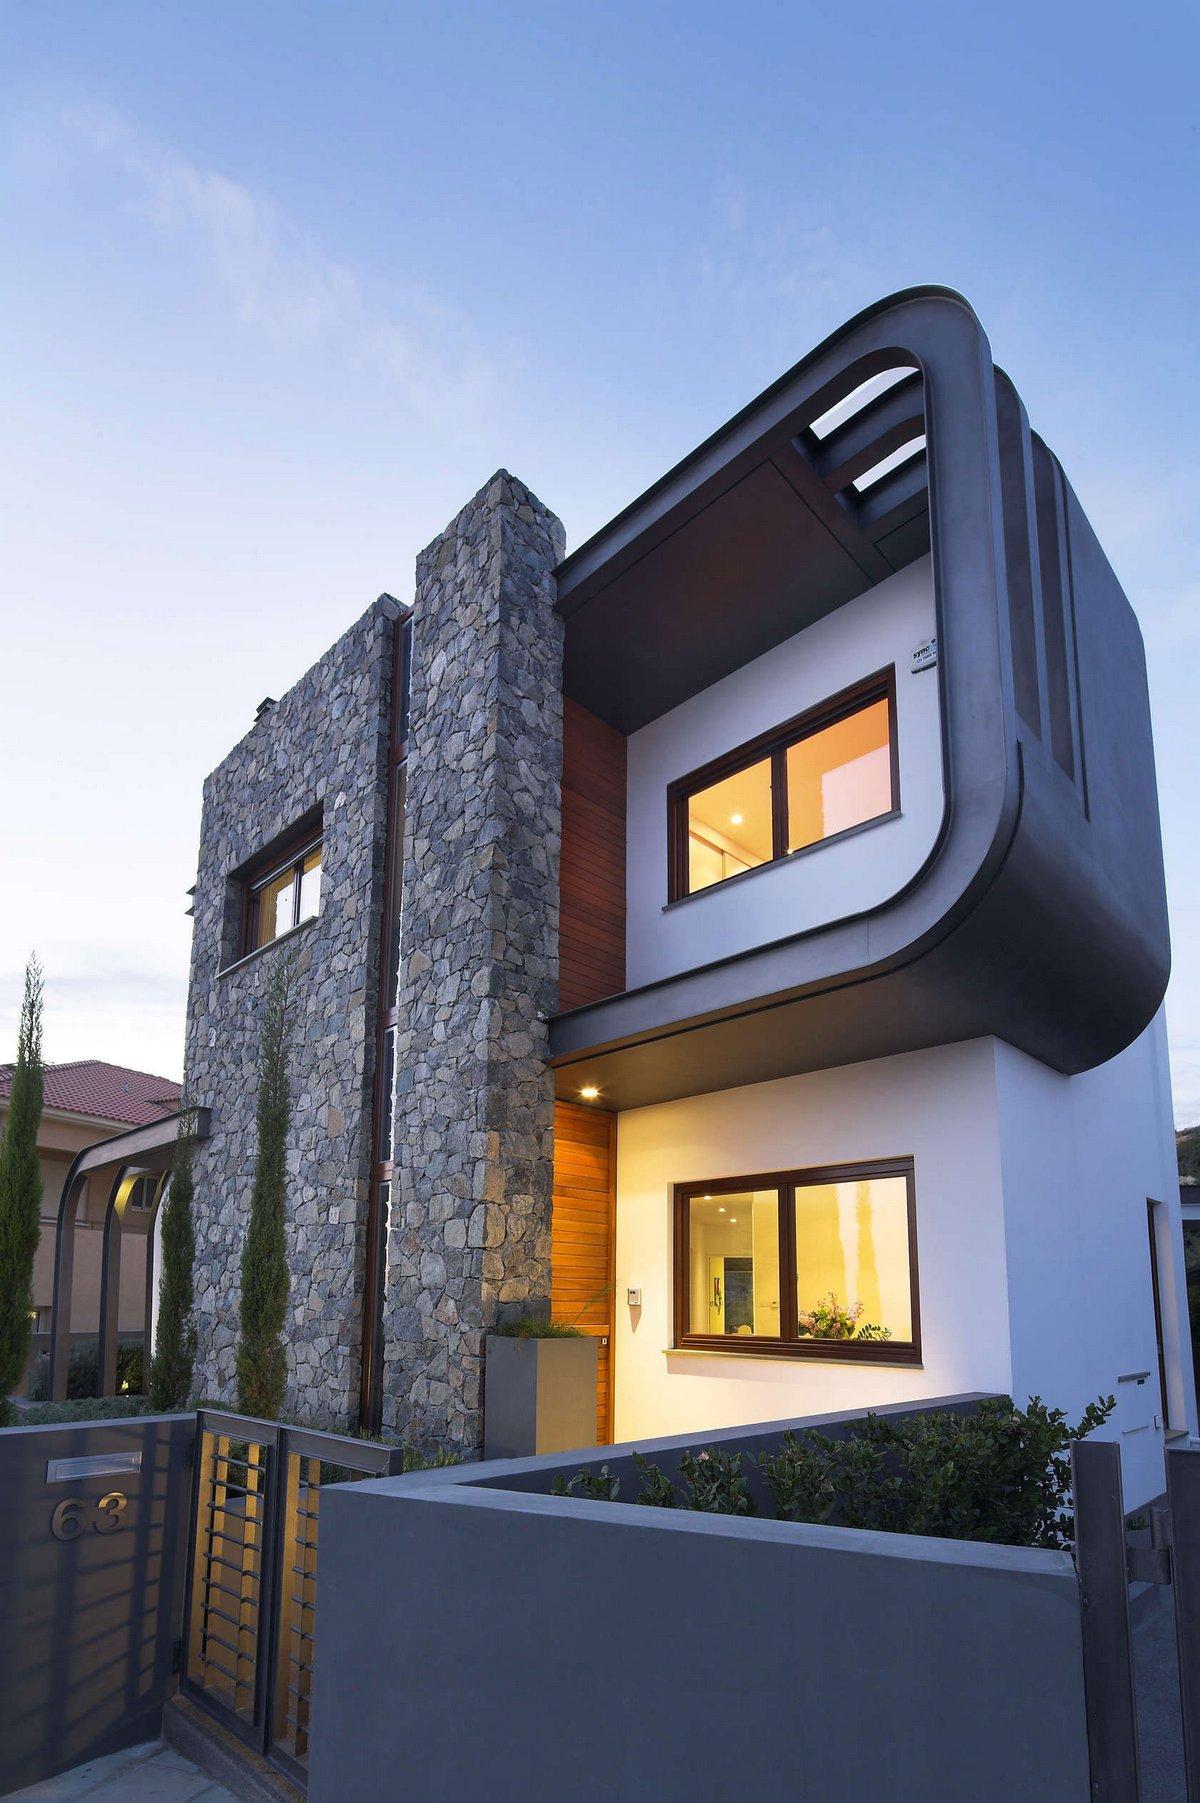 Laiki Lefkothea Residence, Tsikkinis Architecture Studio, планировка частного дома фото, интерьер частного дома фото, необычный частный дом фото